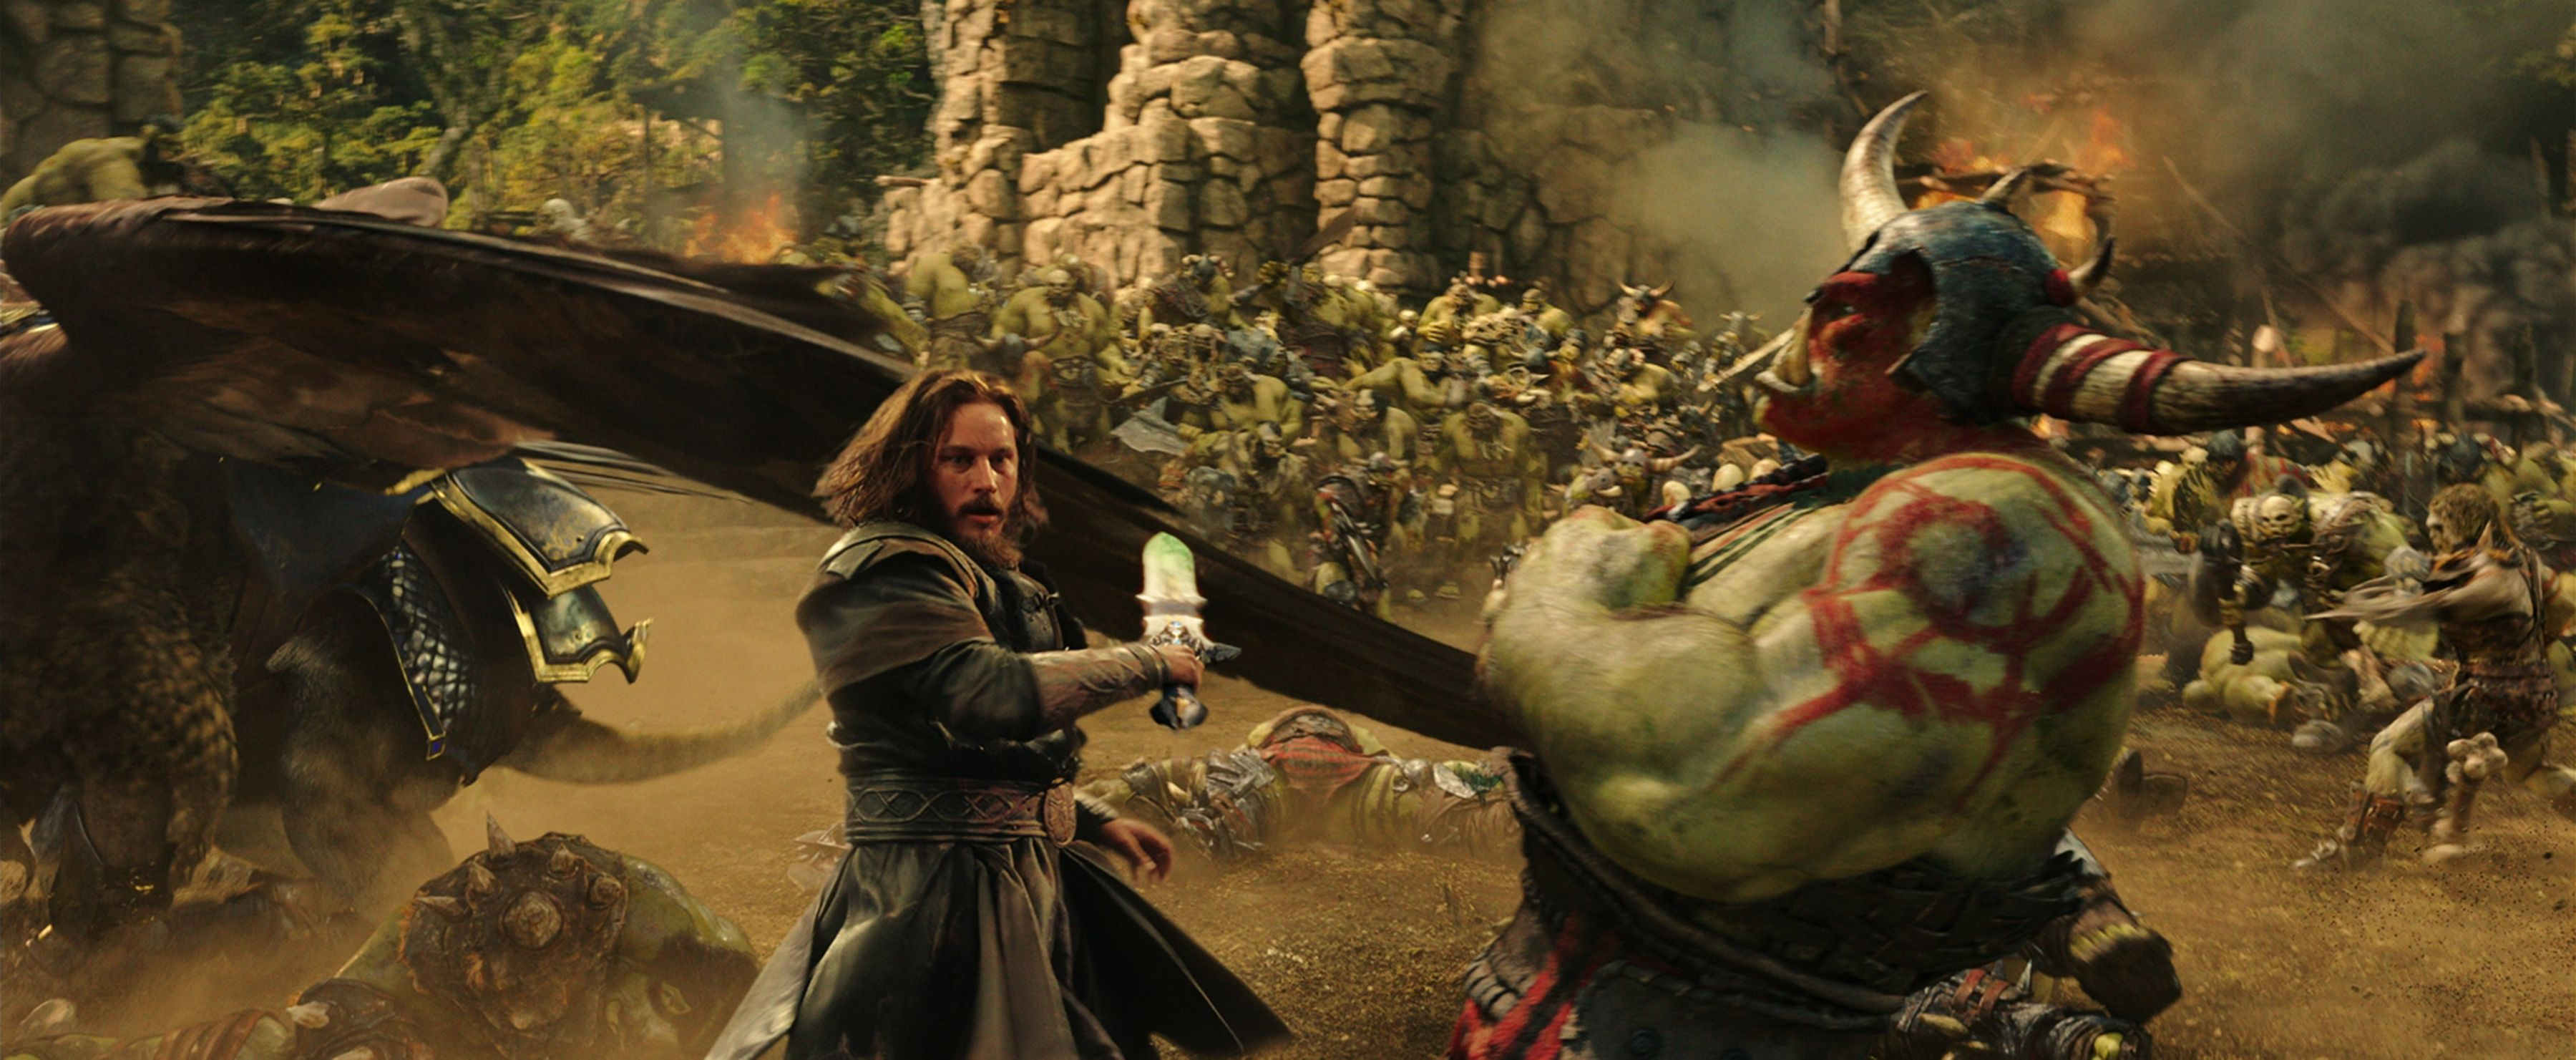 Film World Of Warcraft